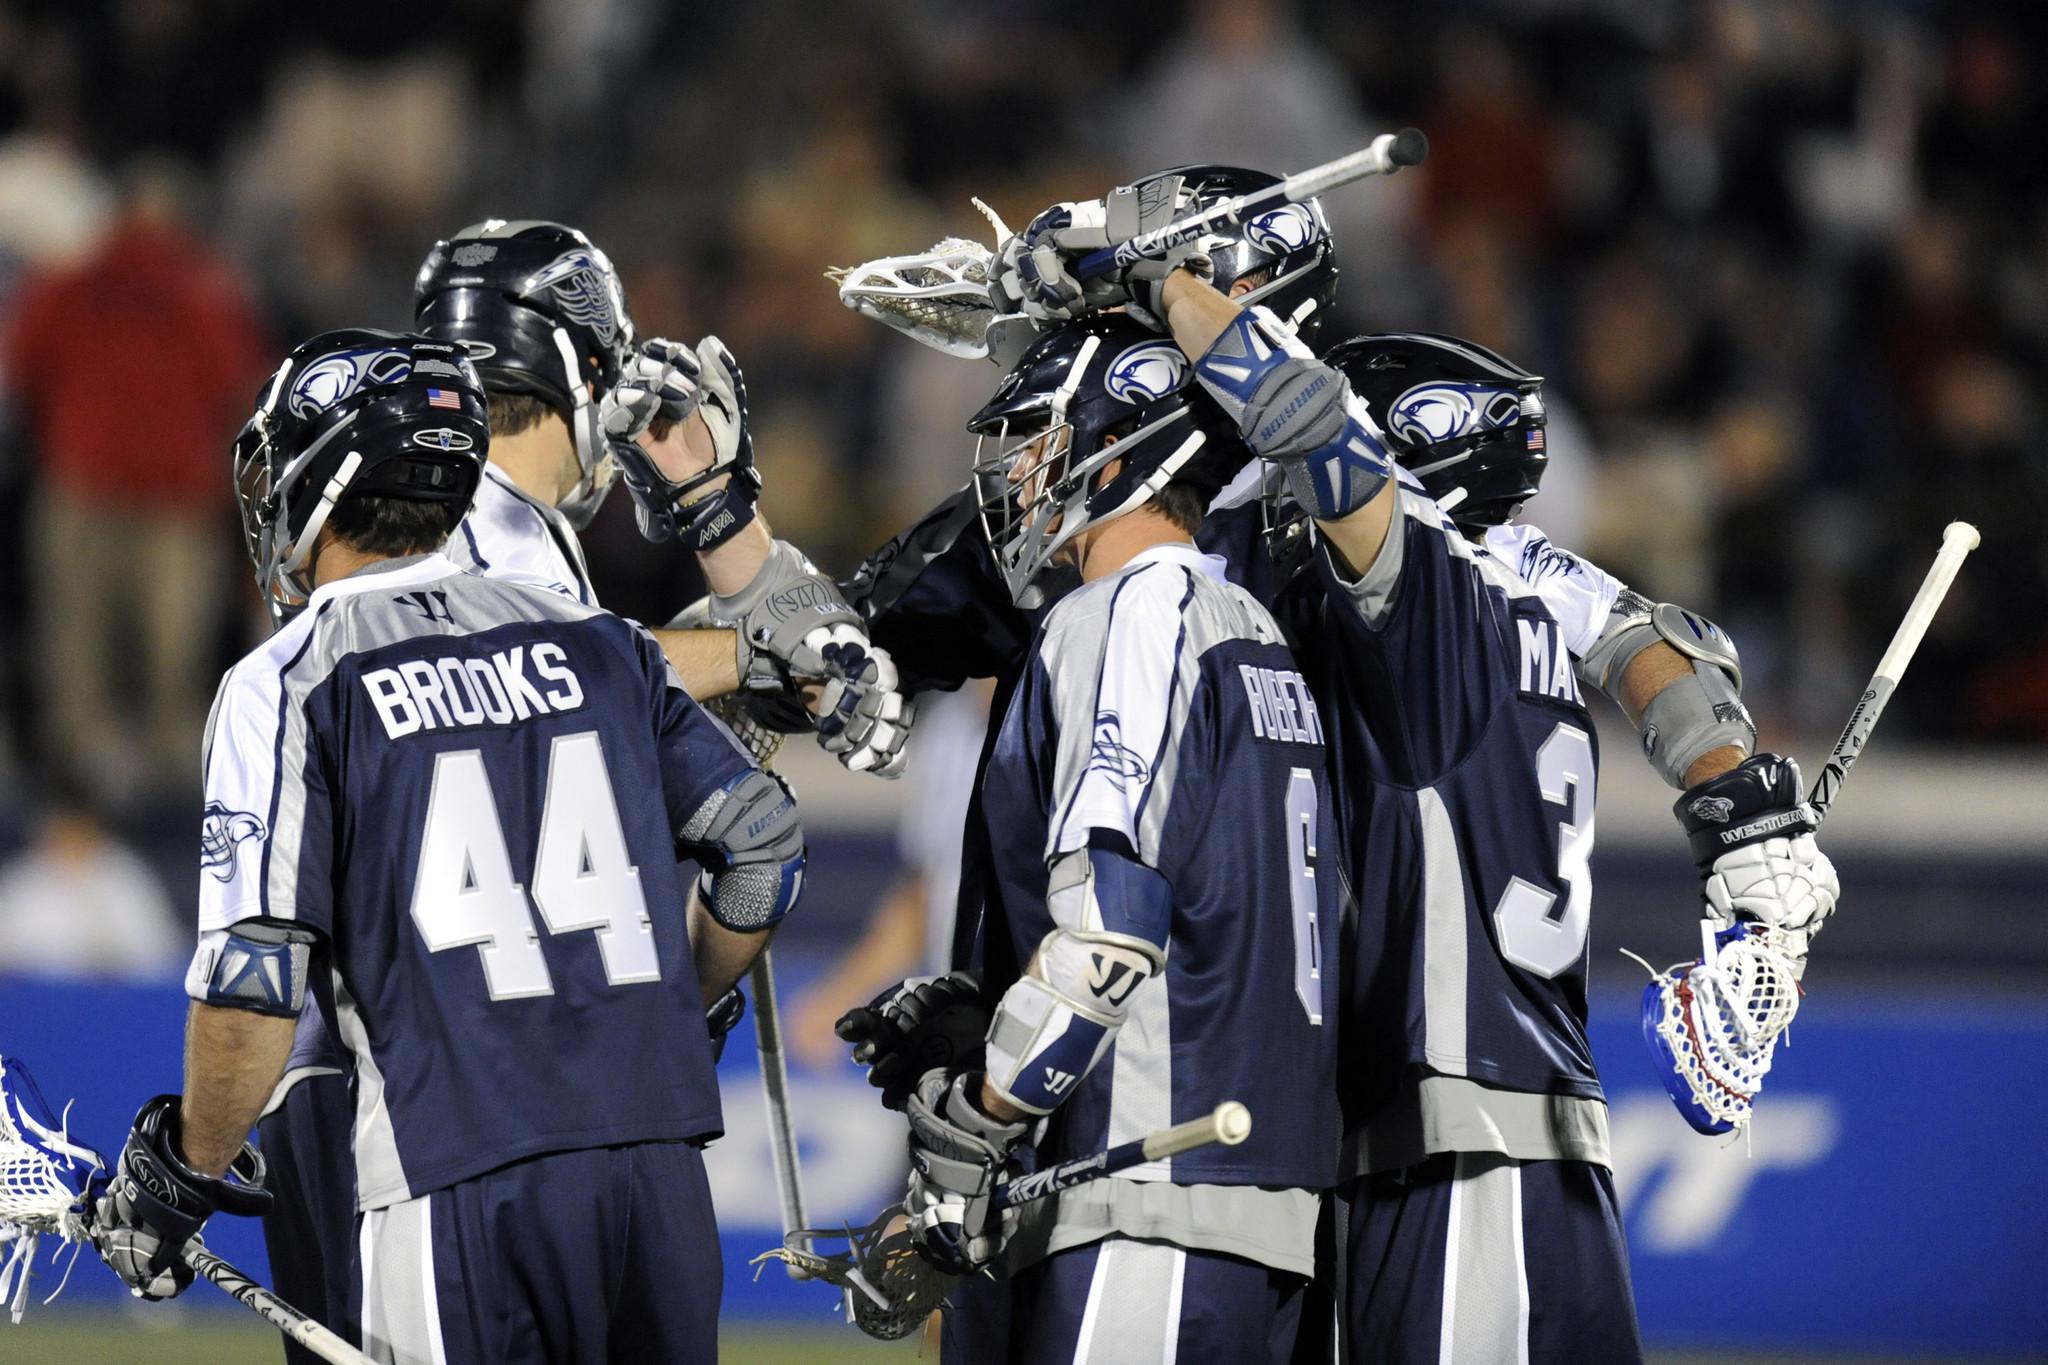 Rubeor scores a career-high seven goals in Bayhawks win vs ...